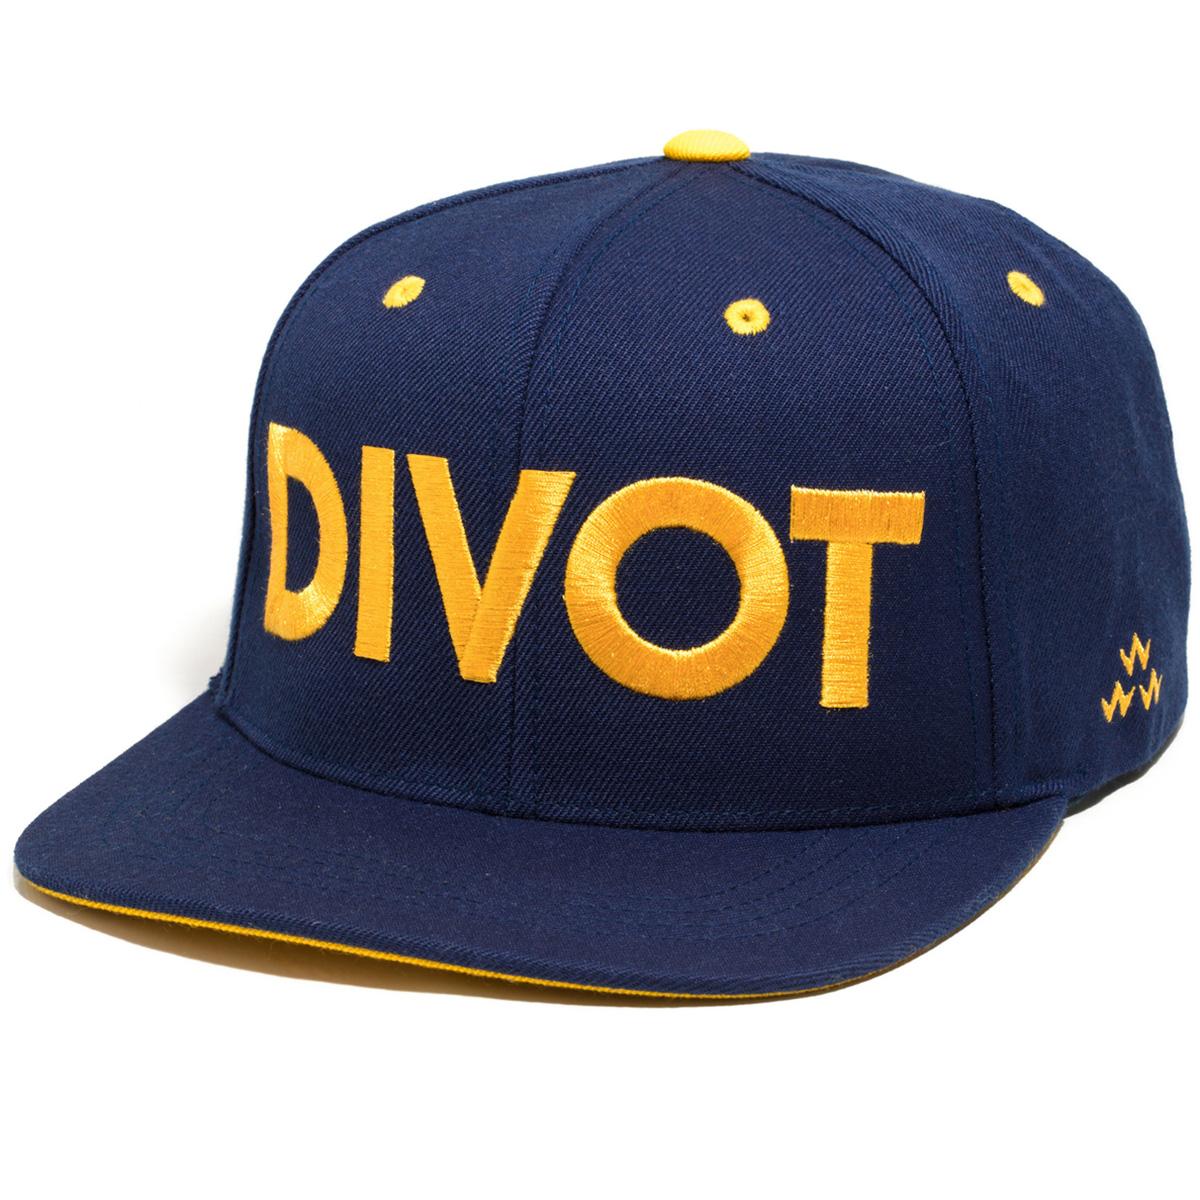 Divot キャップ